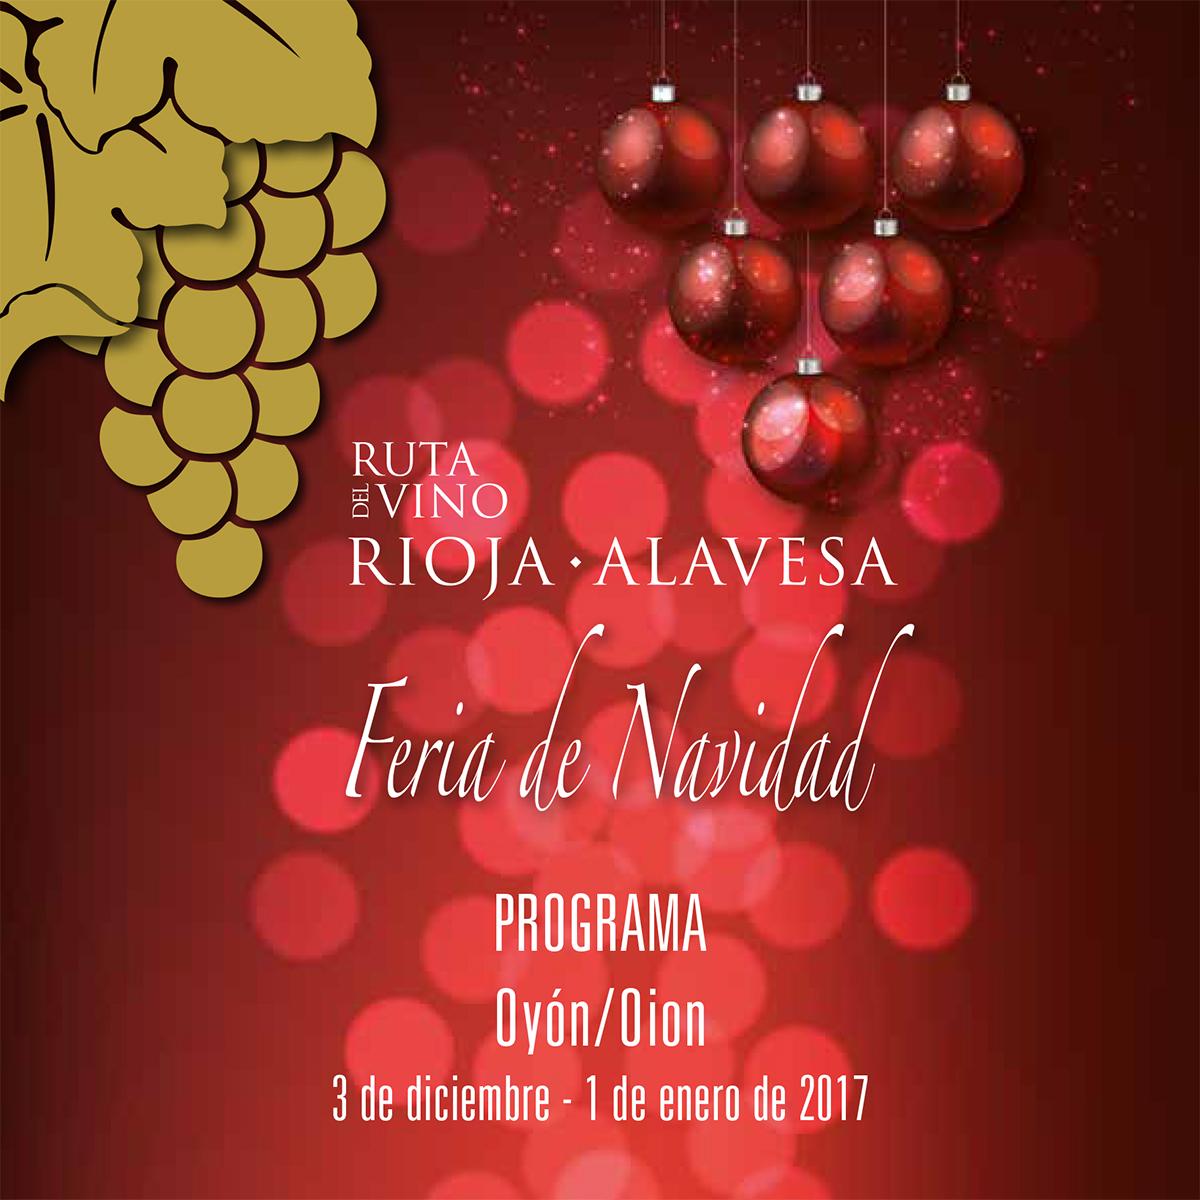 Bodegas Ondalán. Feria de Navidad Ruta del Vino de Rioja Alavesa en Oyón-Oion 2016